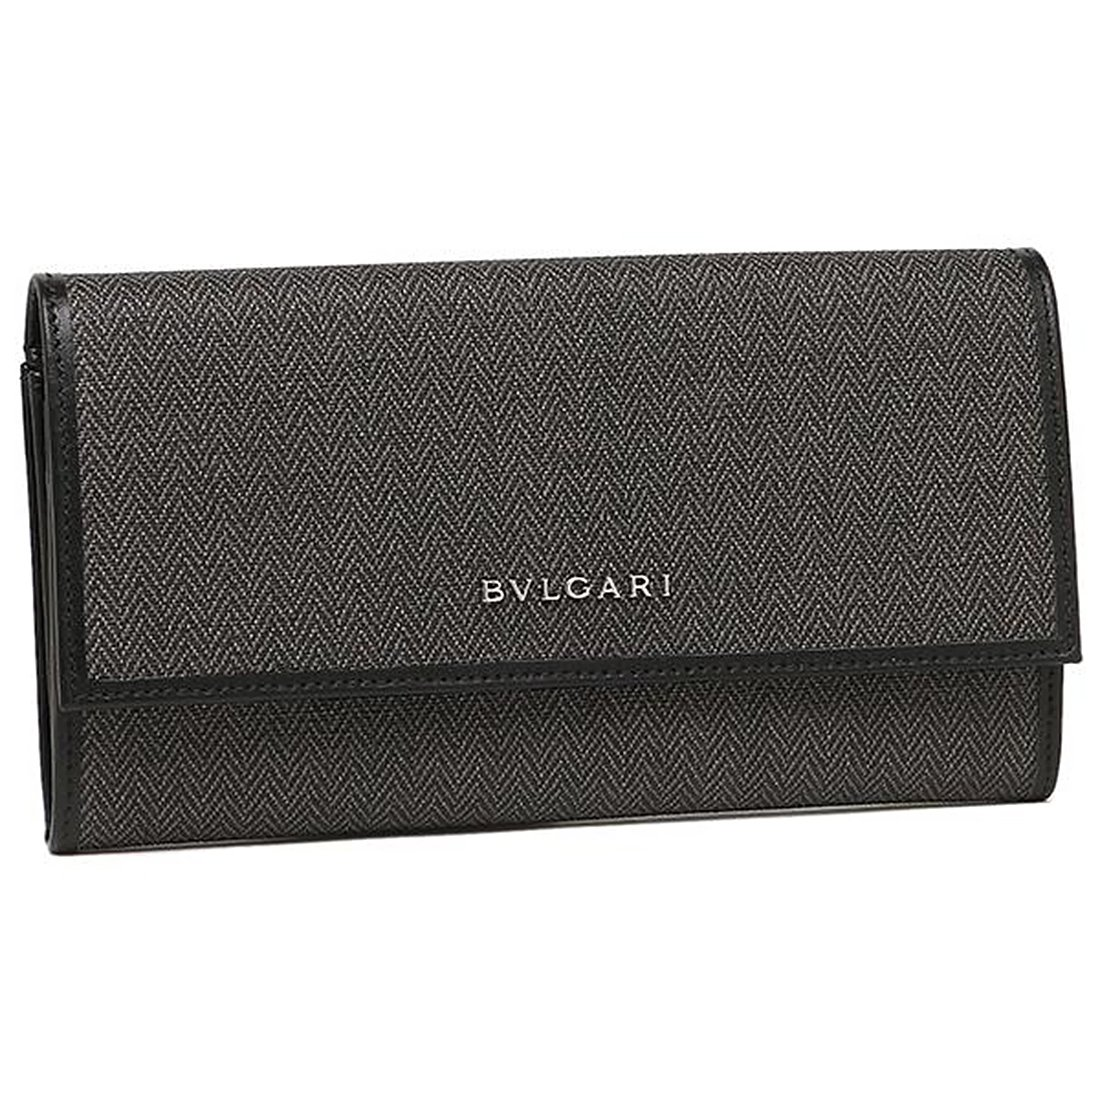 243e82f8acd6 Amazon | [ブルガリ] 長財布 レディース BVLGARI 32585 WEEKEND ブラック [並行輸入品] | 財布